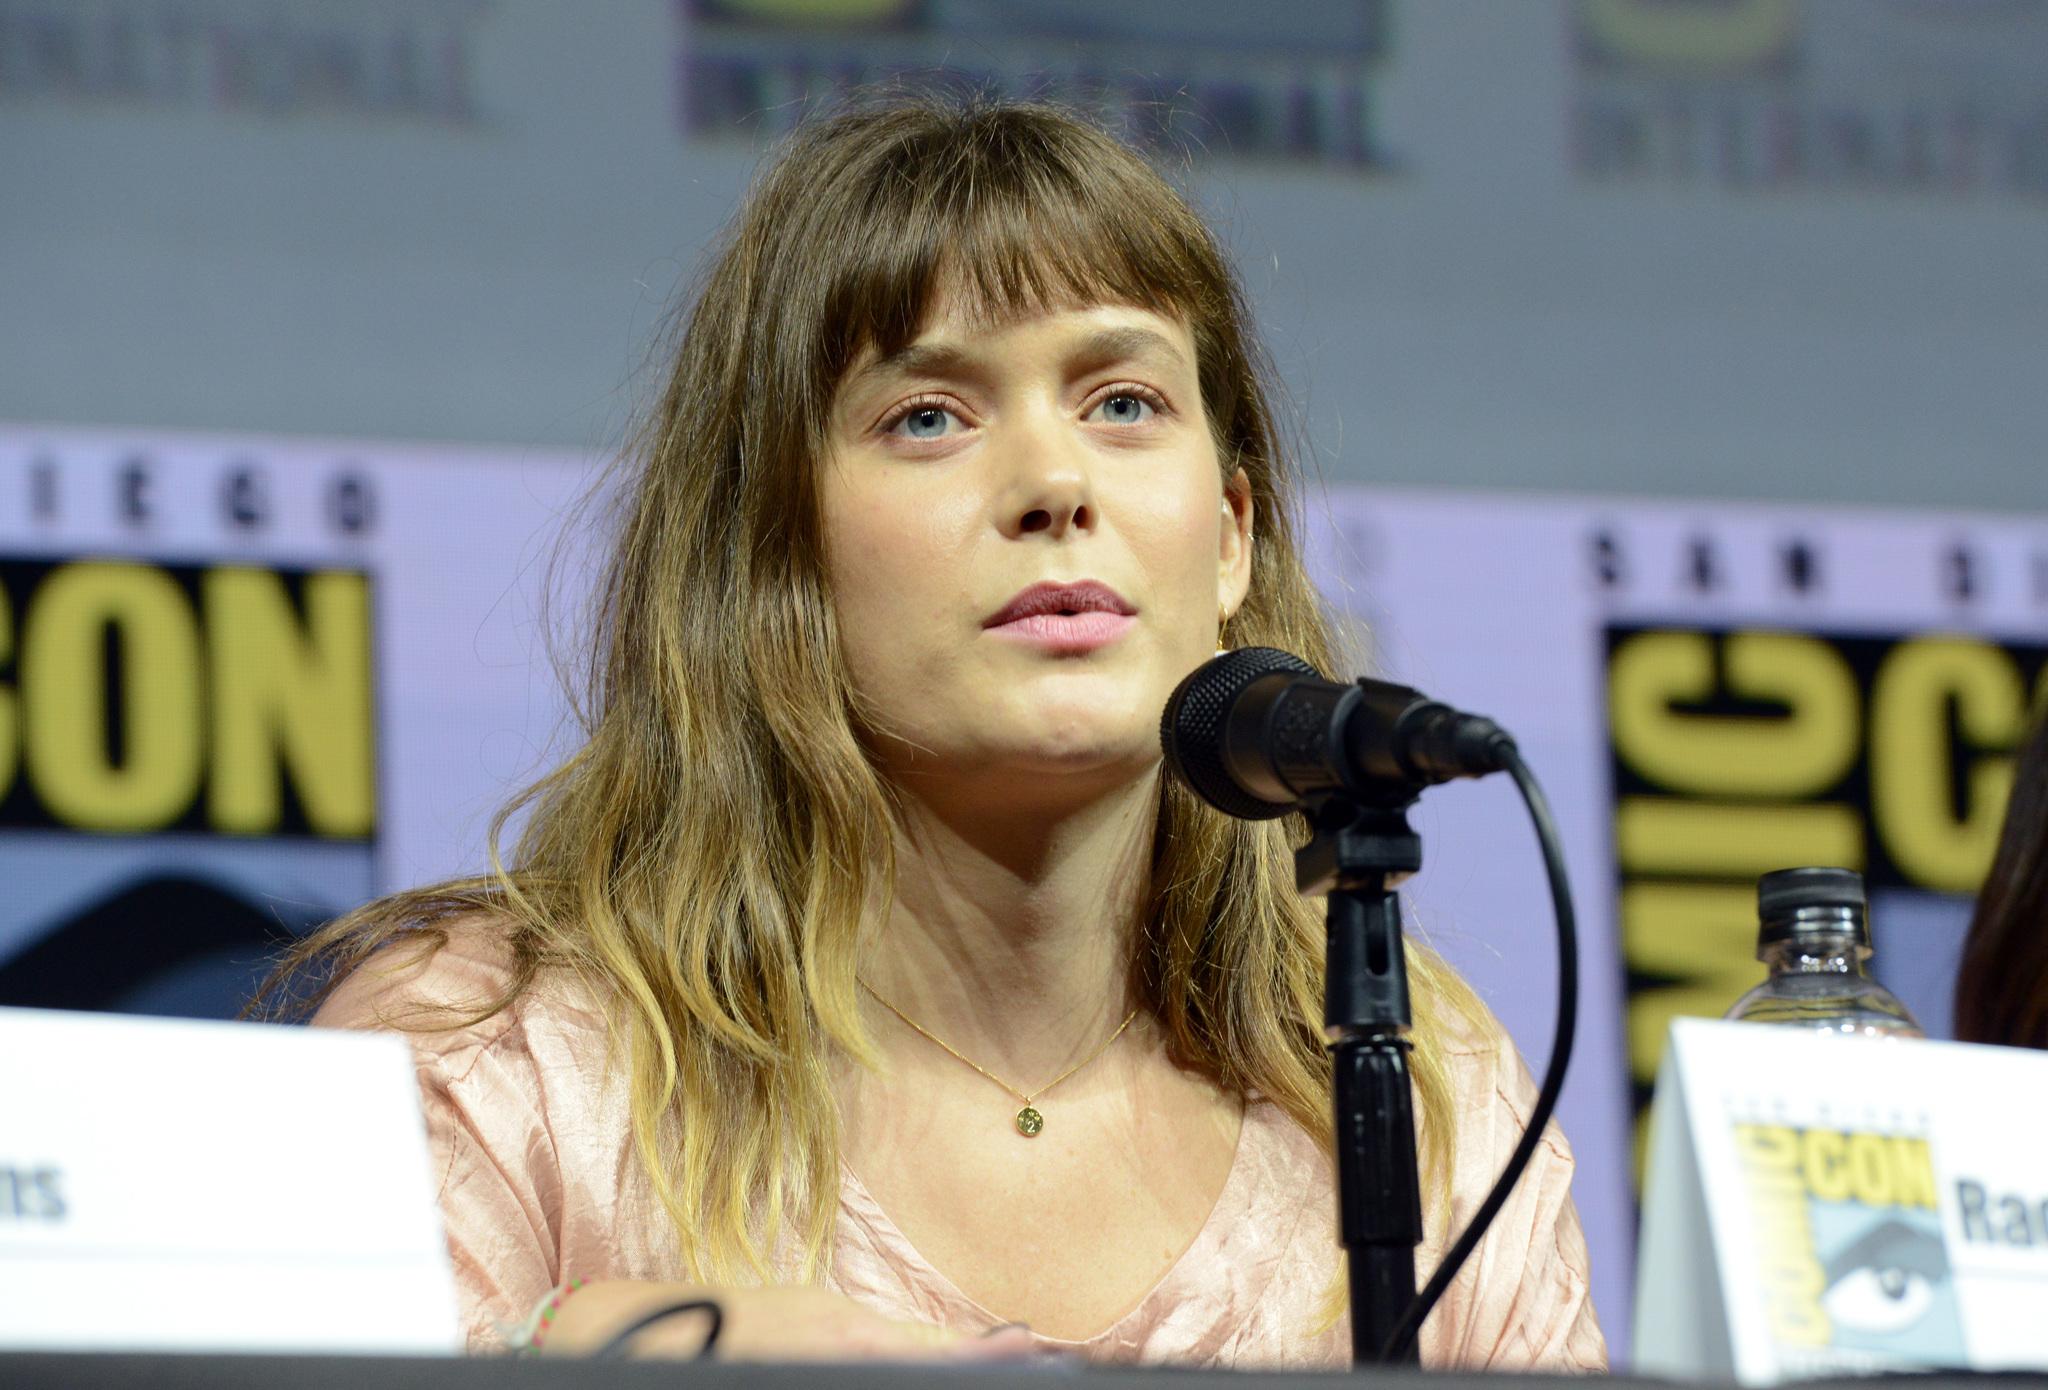 Rachel Keller at an event for Legion (2017)